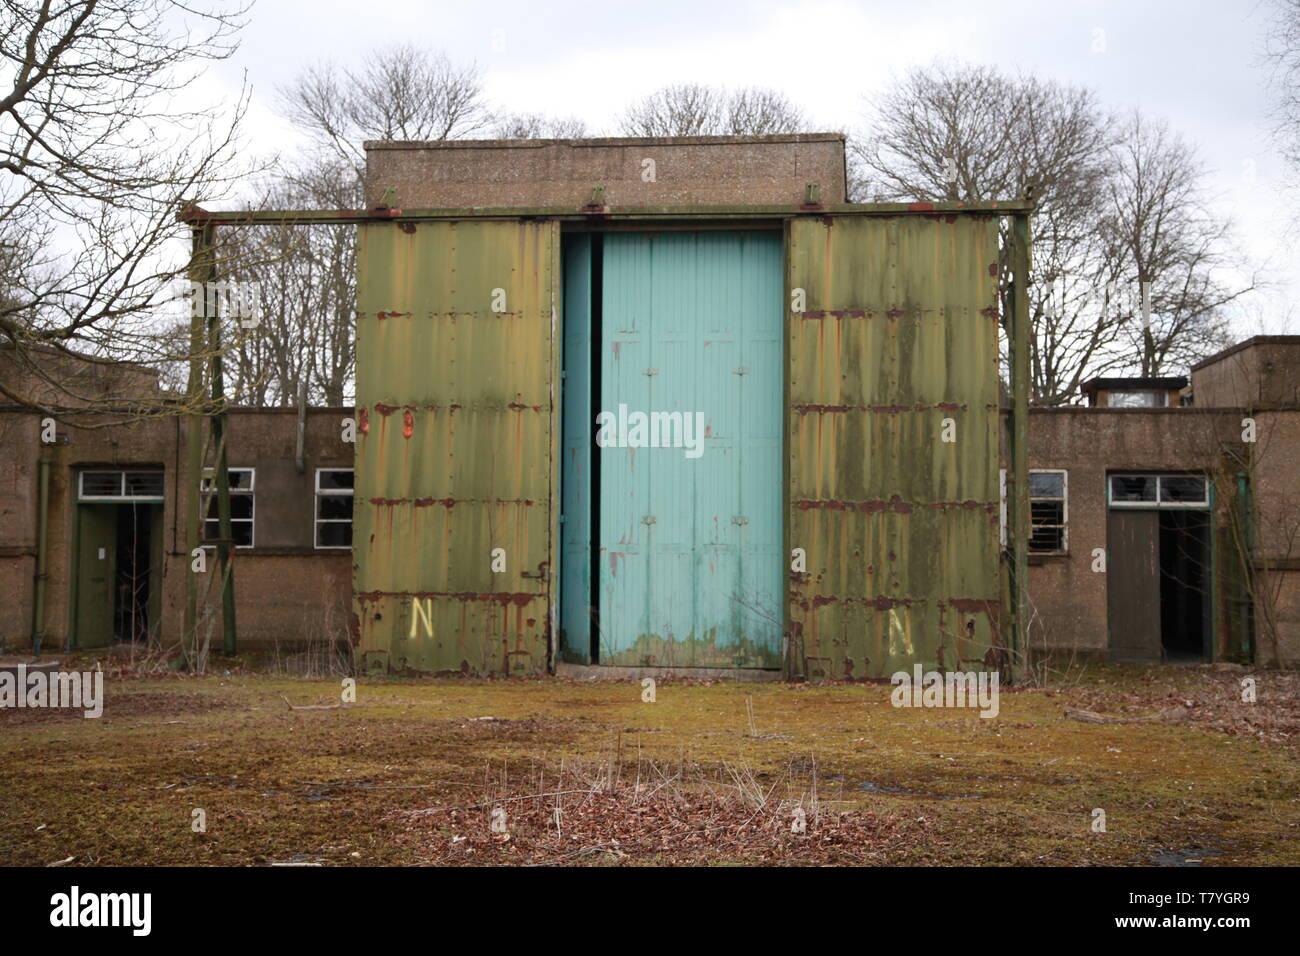 RAF Driffield, ww2 airfield, store with blast proof doors